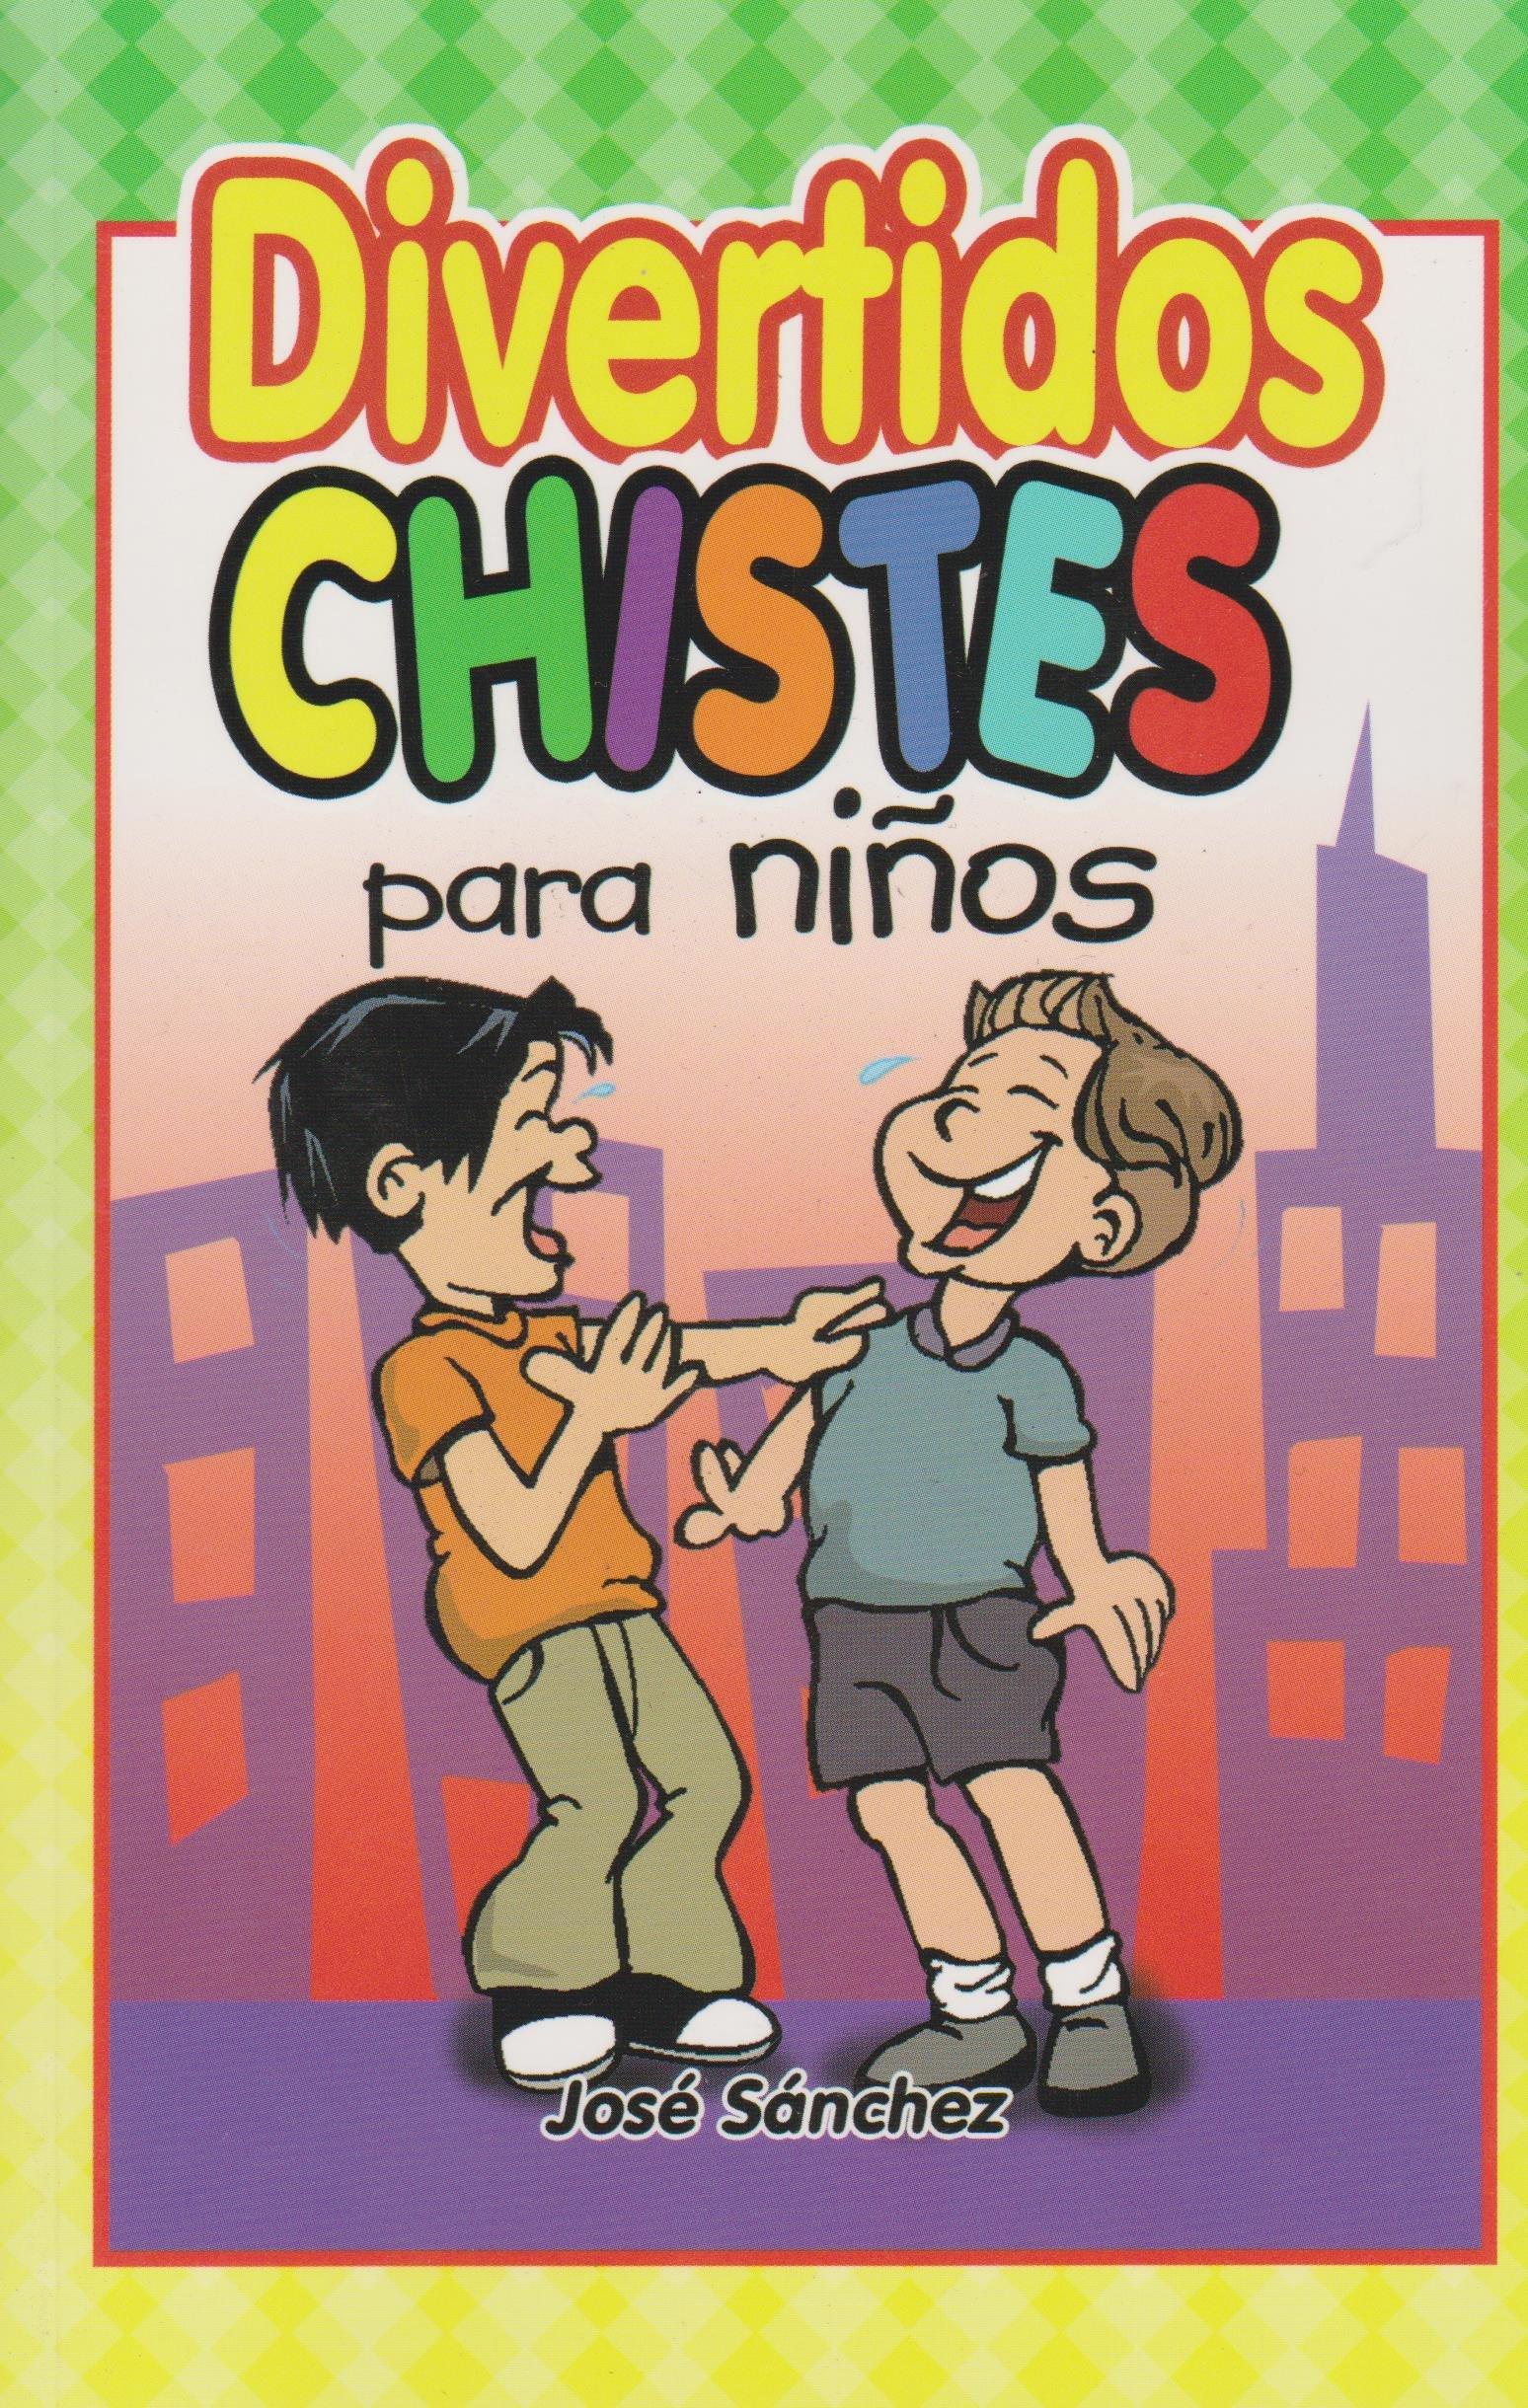 Divertidos chistes para ninos (Spanish Edition) (Spanish) Paperback – February 1, 2005